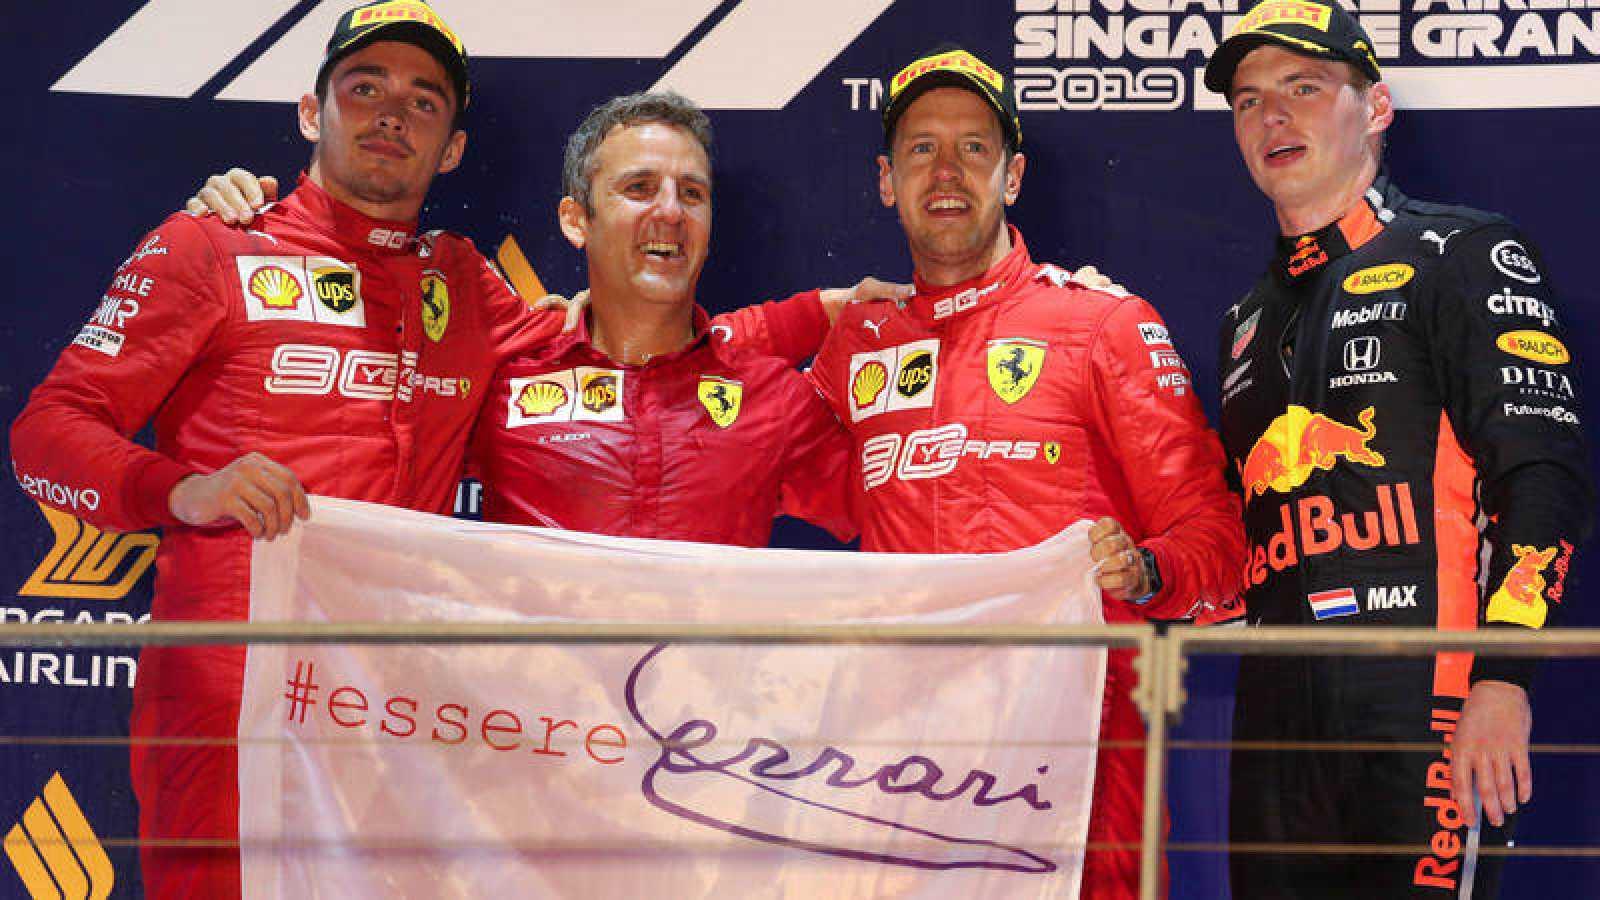 Charles Leclerc y Sebastian Vettel flanquean al director de Ferrari en el podio de Singapur, con Verstappen a la derecha.